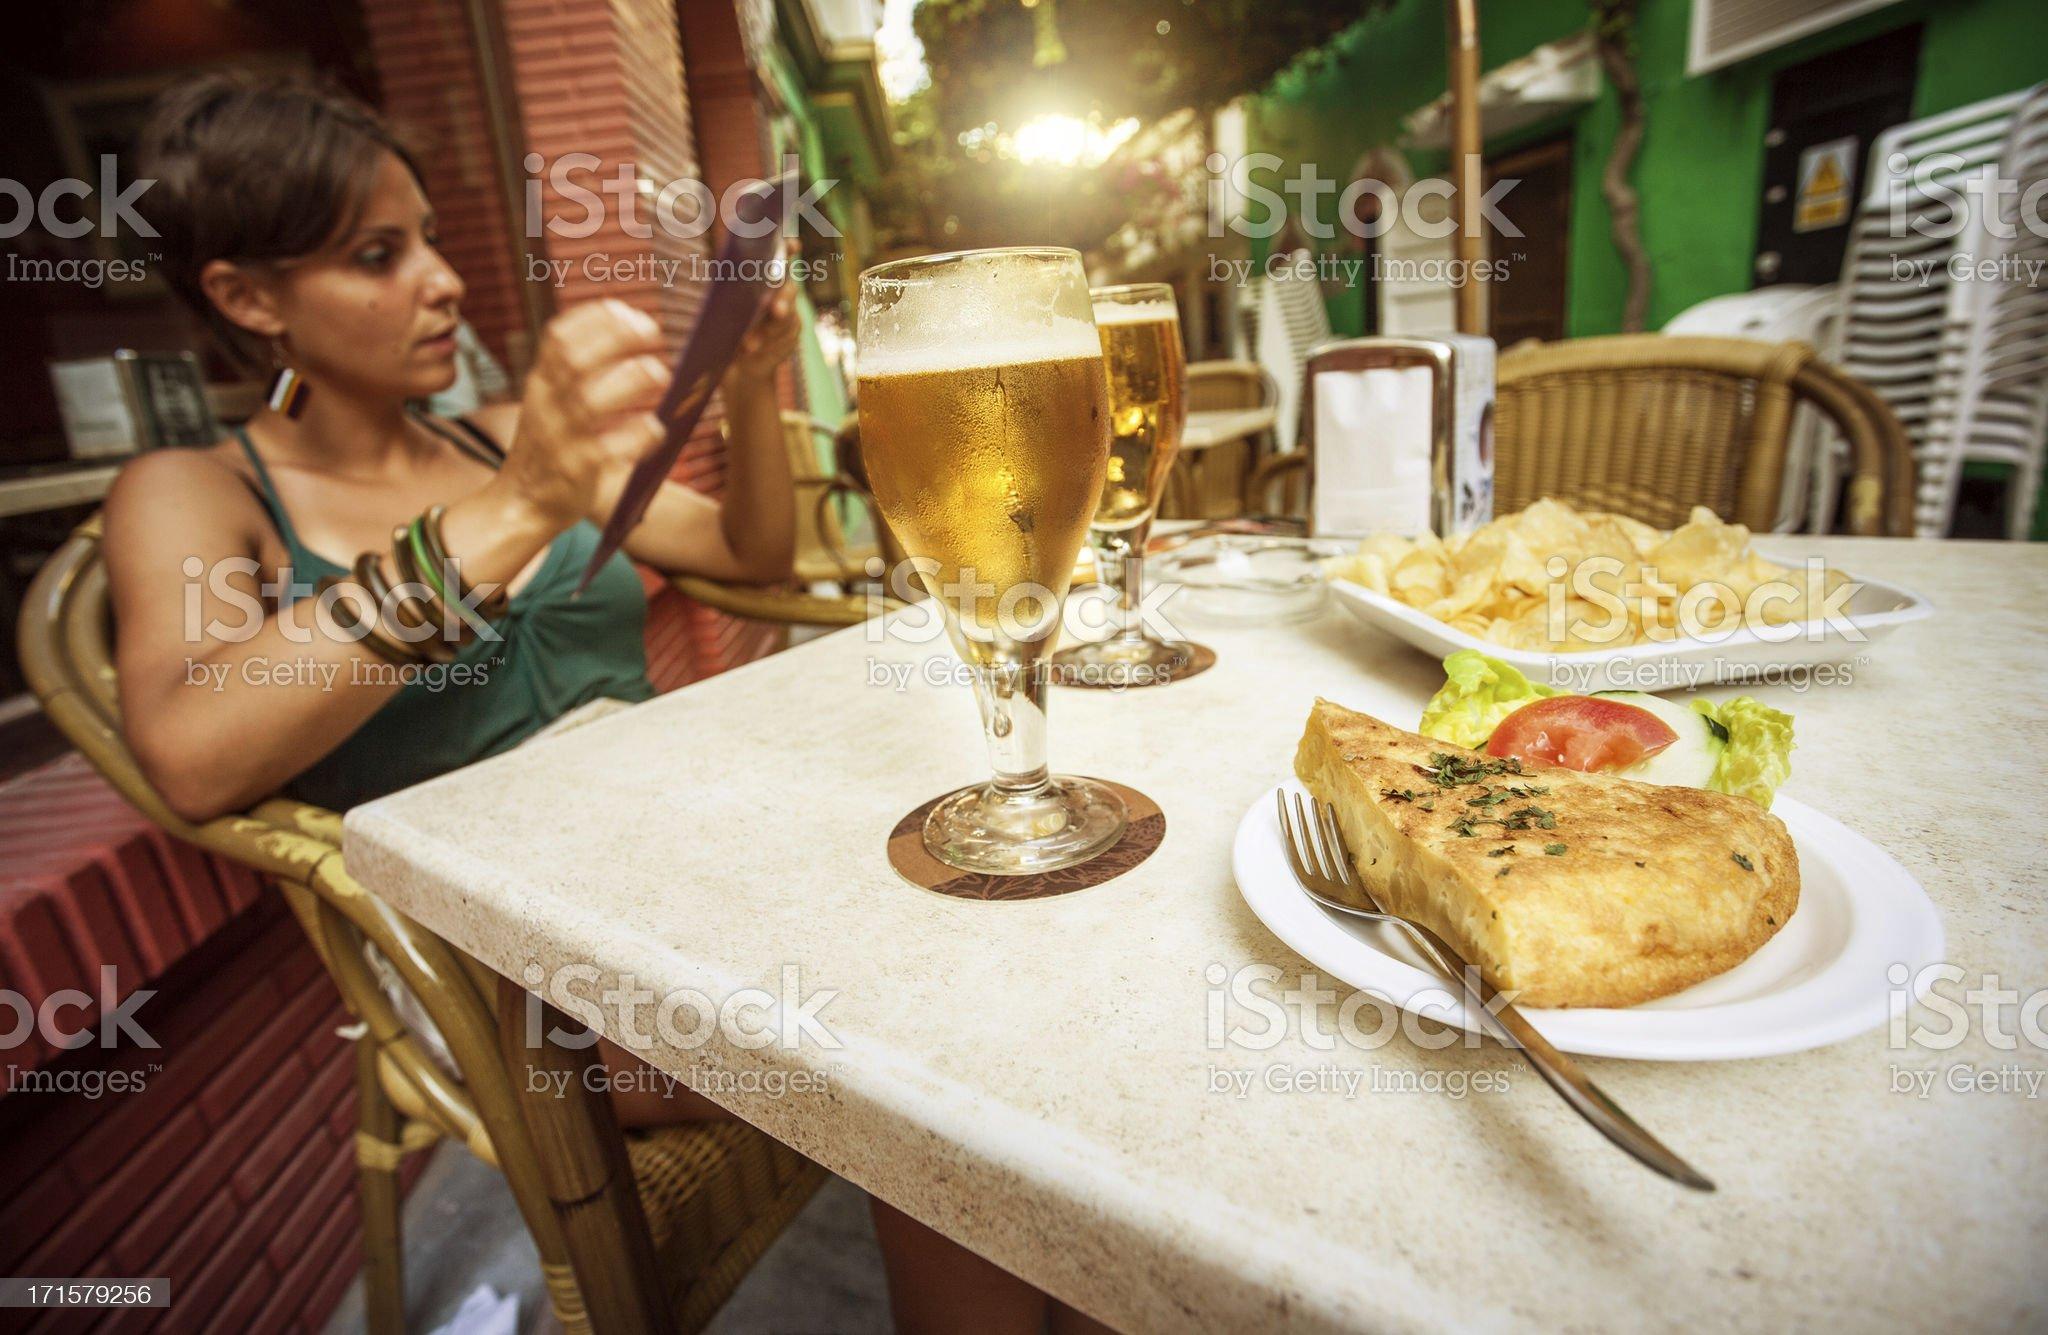 Enjoying Spanish Tapas and Beer royalty-free stock photo